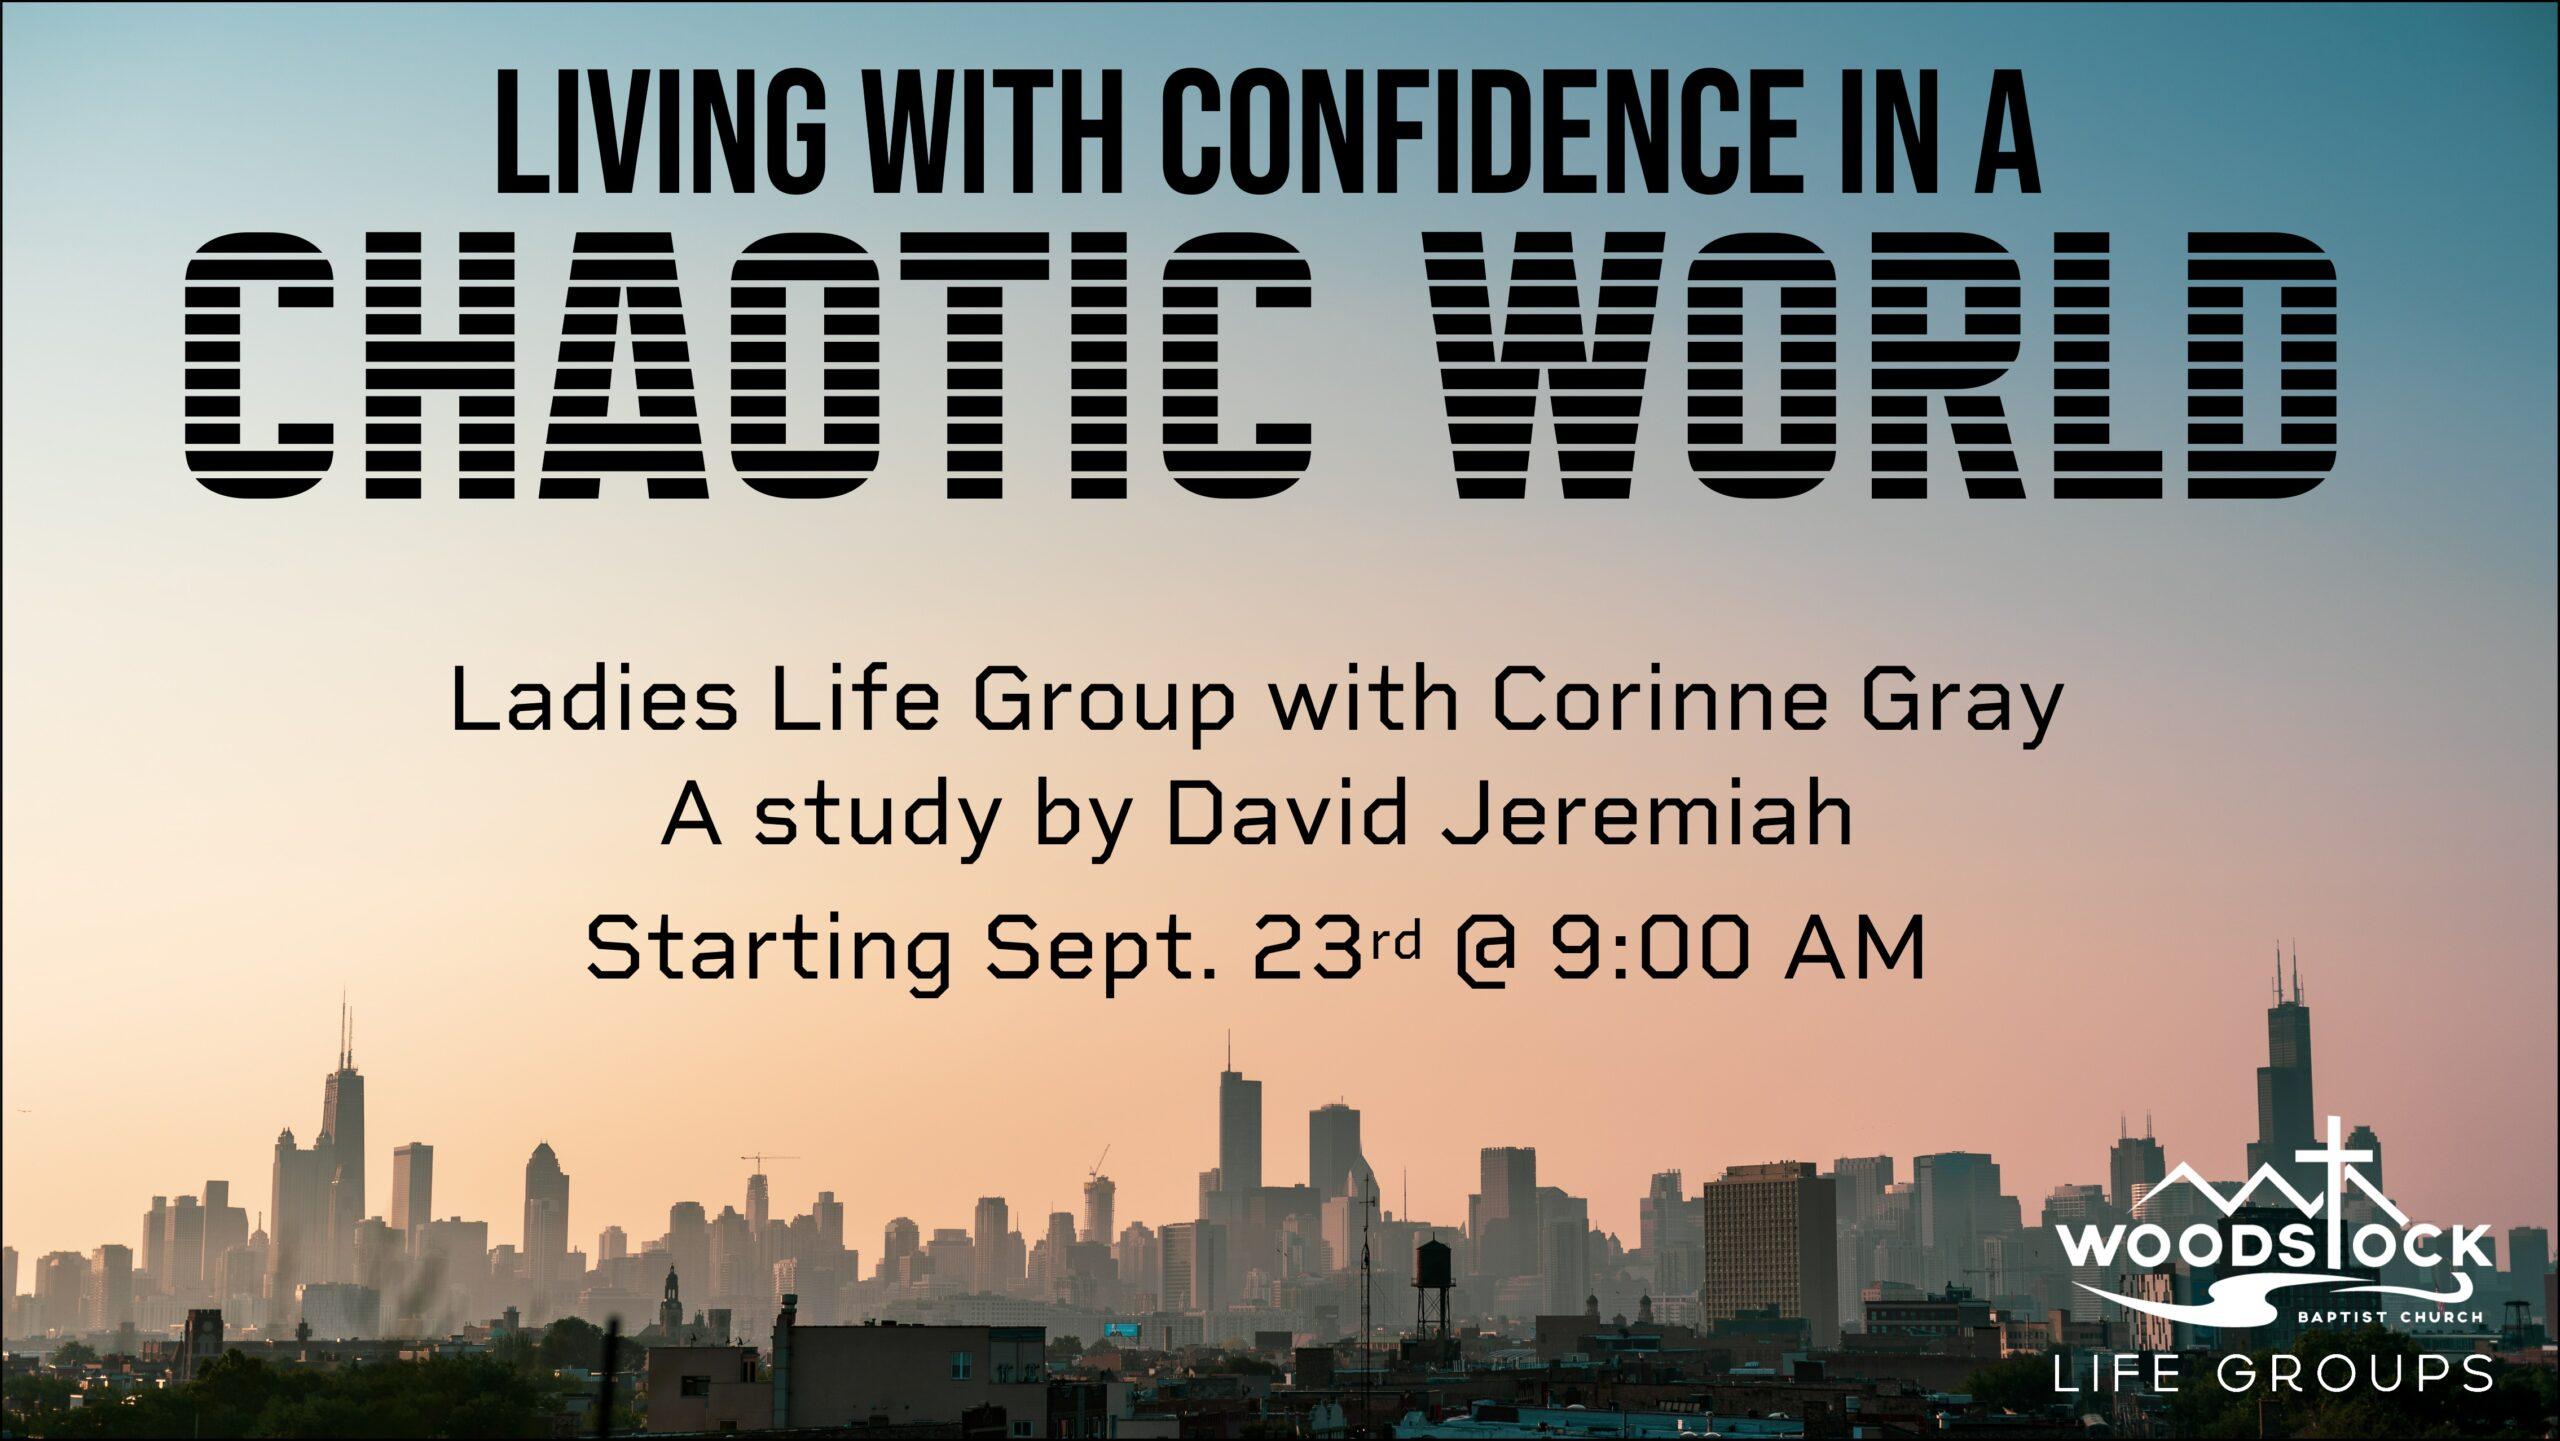 Corinne's Life Group